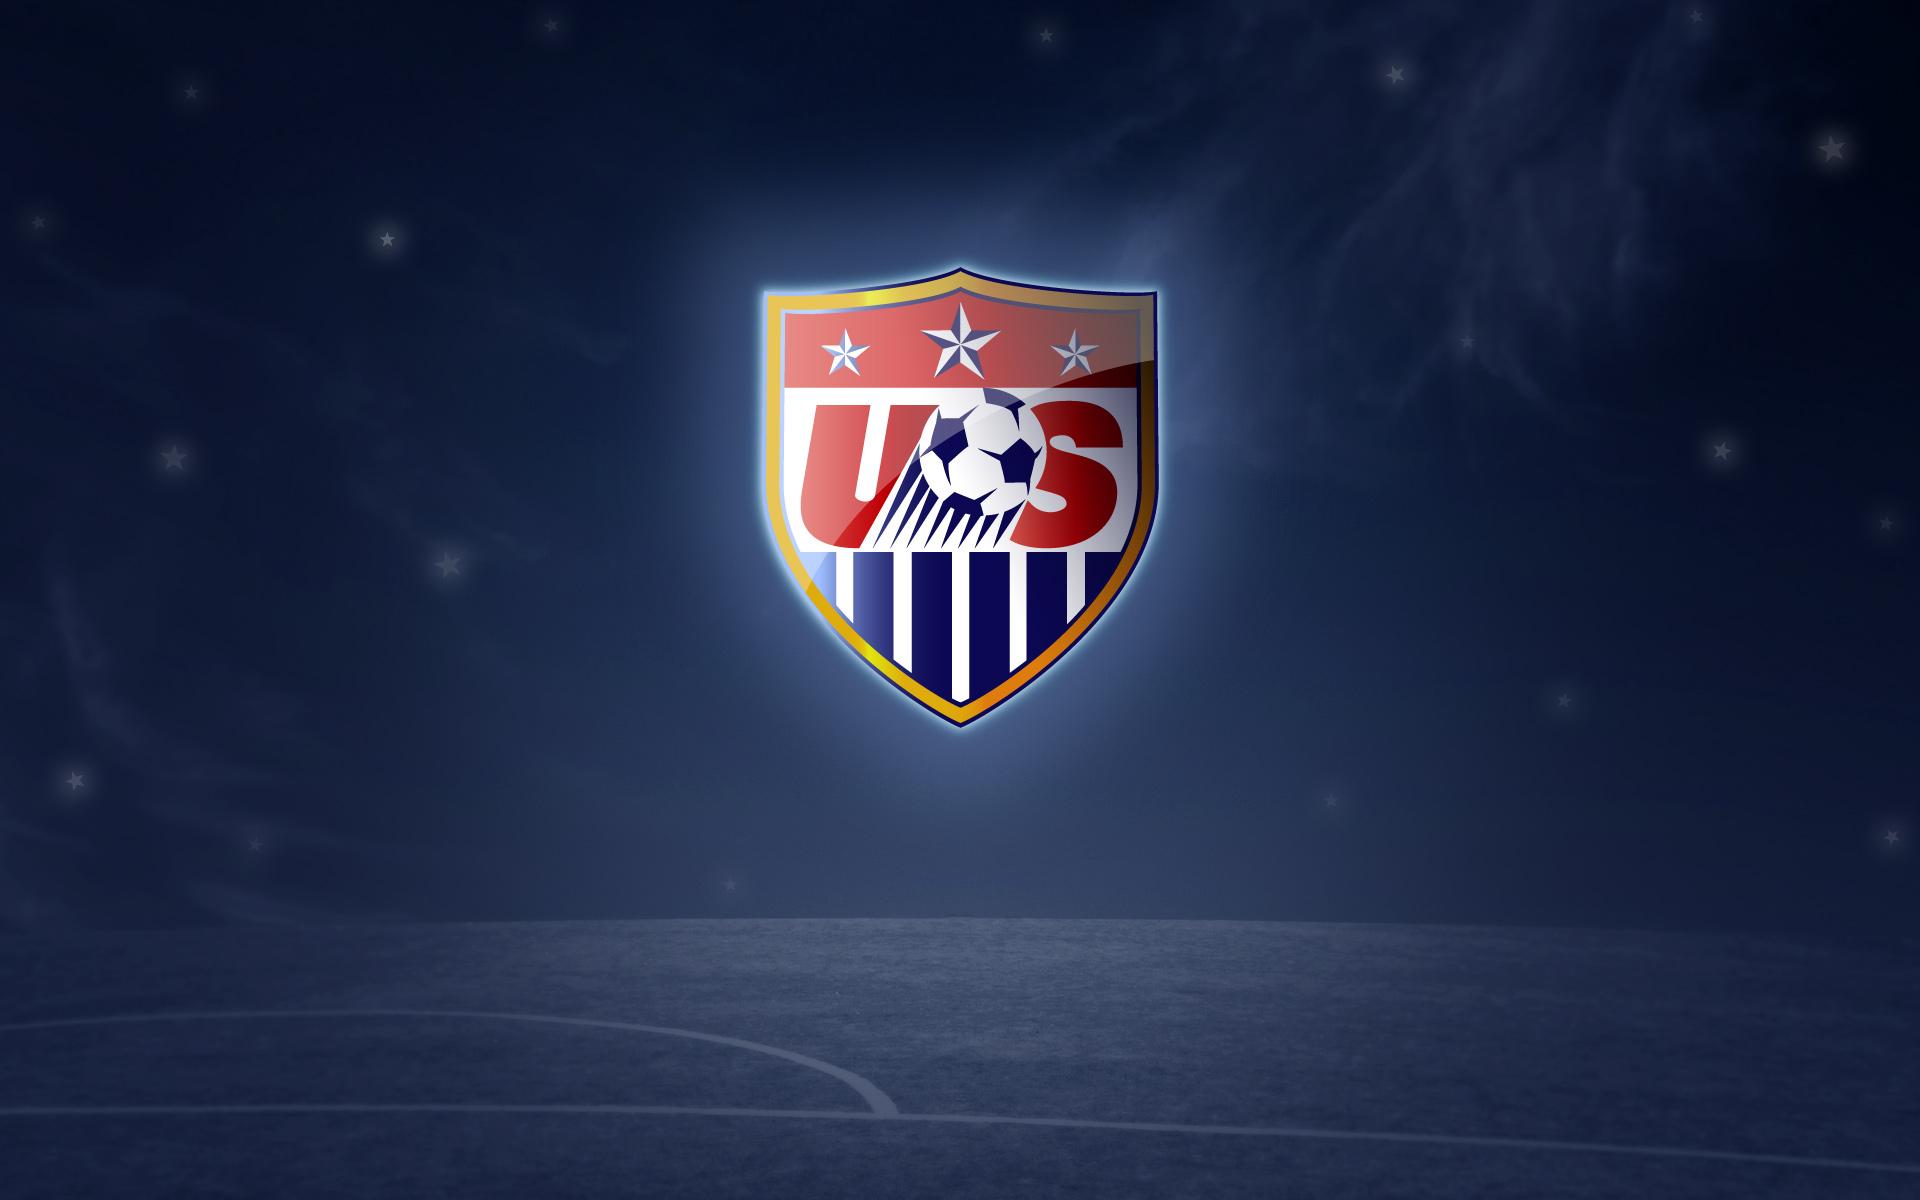 U.S. Soccer Logo Wallpaper